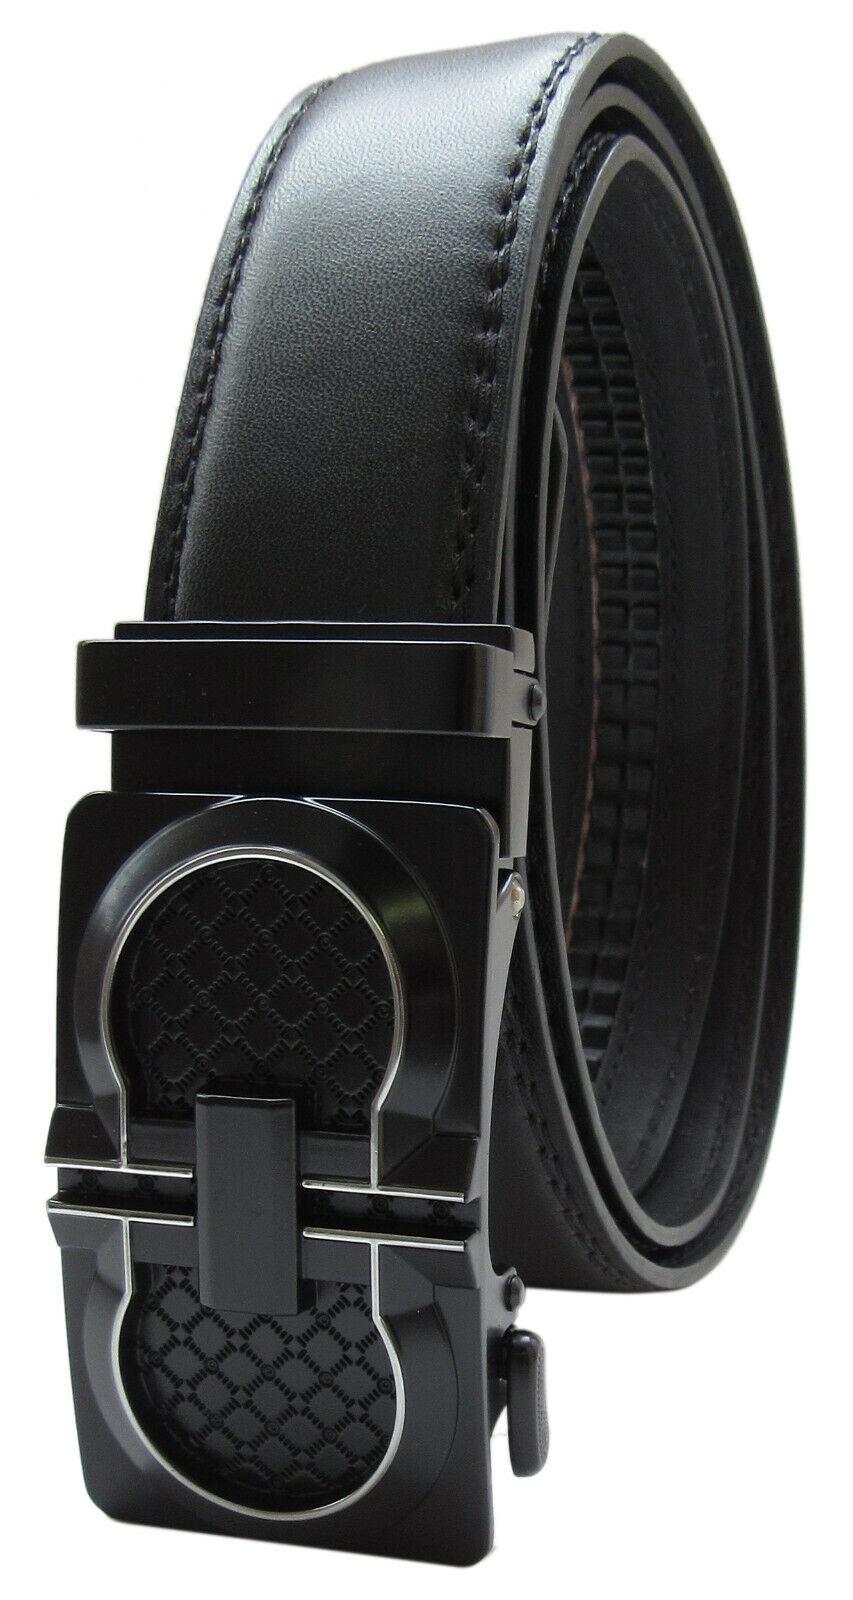 Automatic Ratchet Click Lock Buckle Black Leather Belt Italian Design Buckle B46 Belts